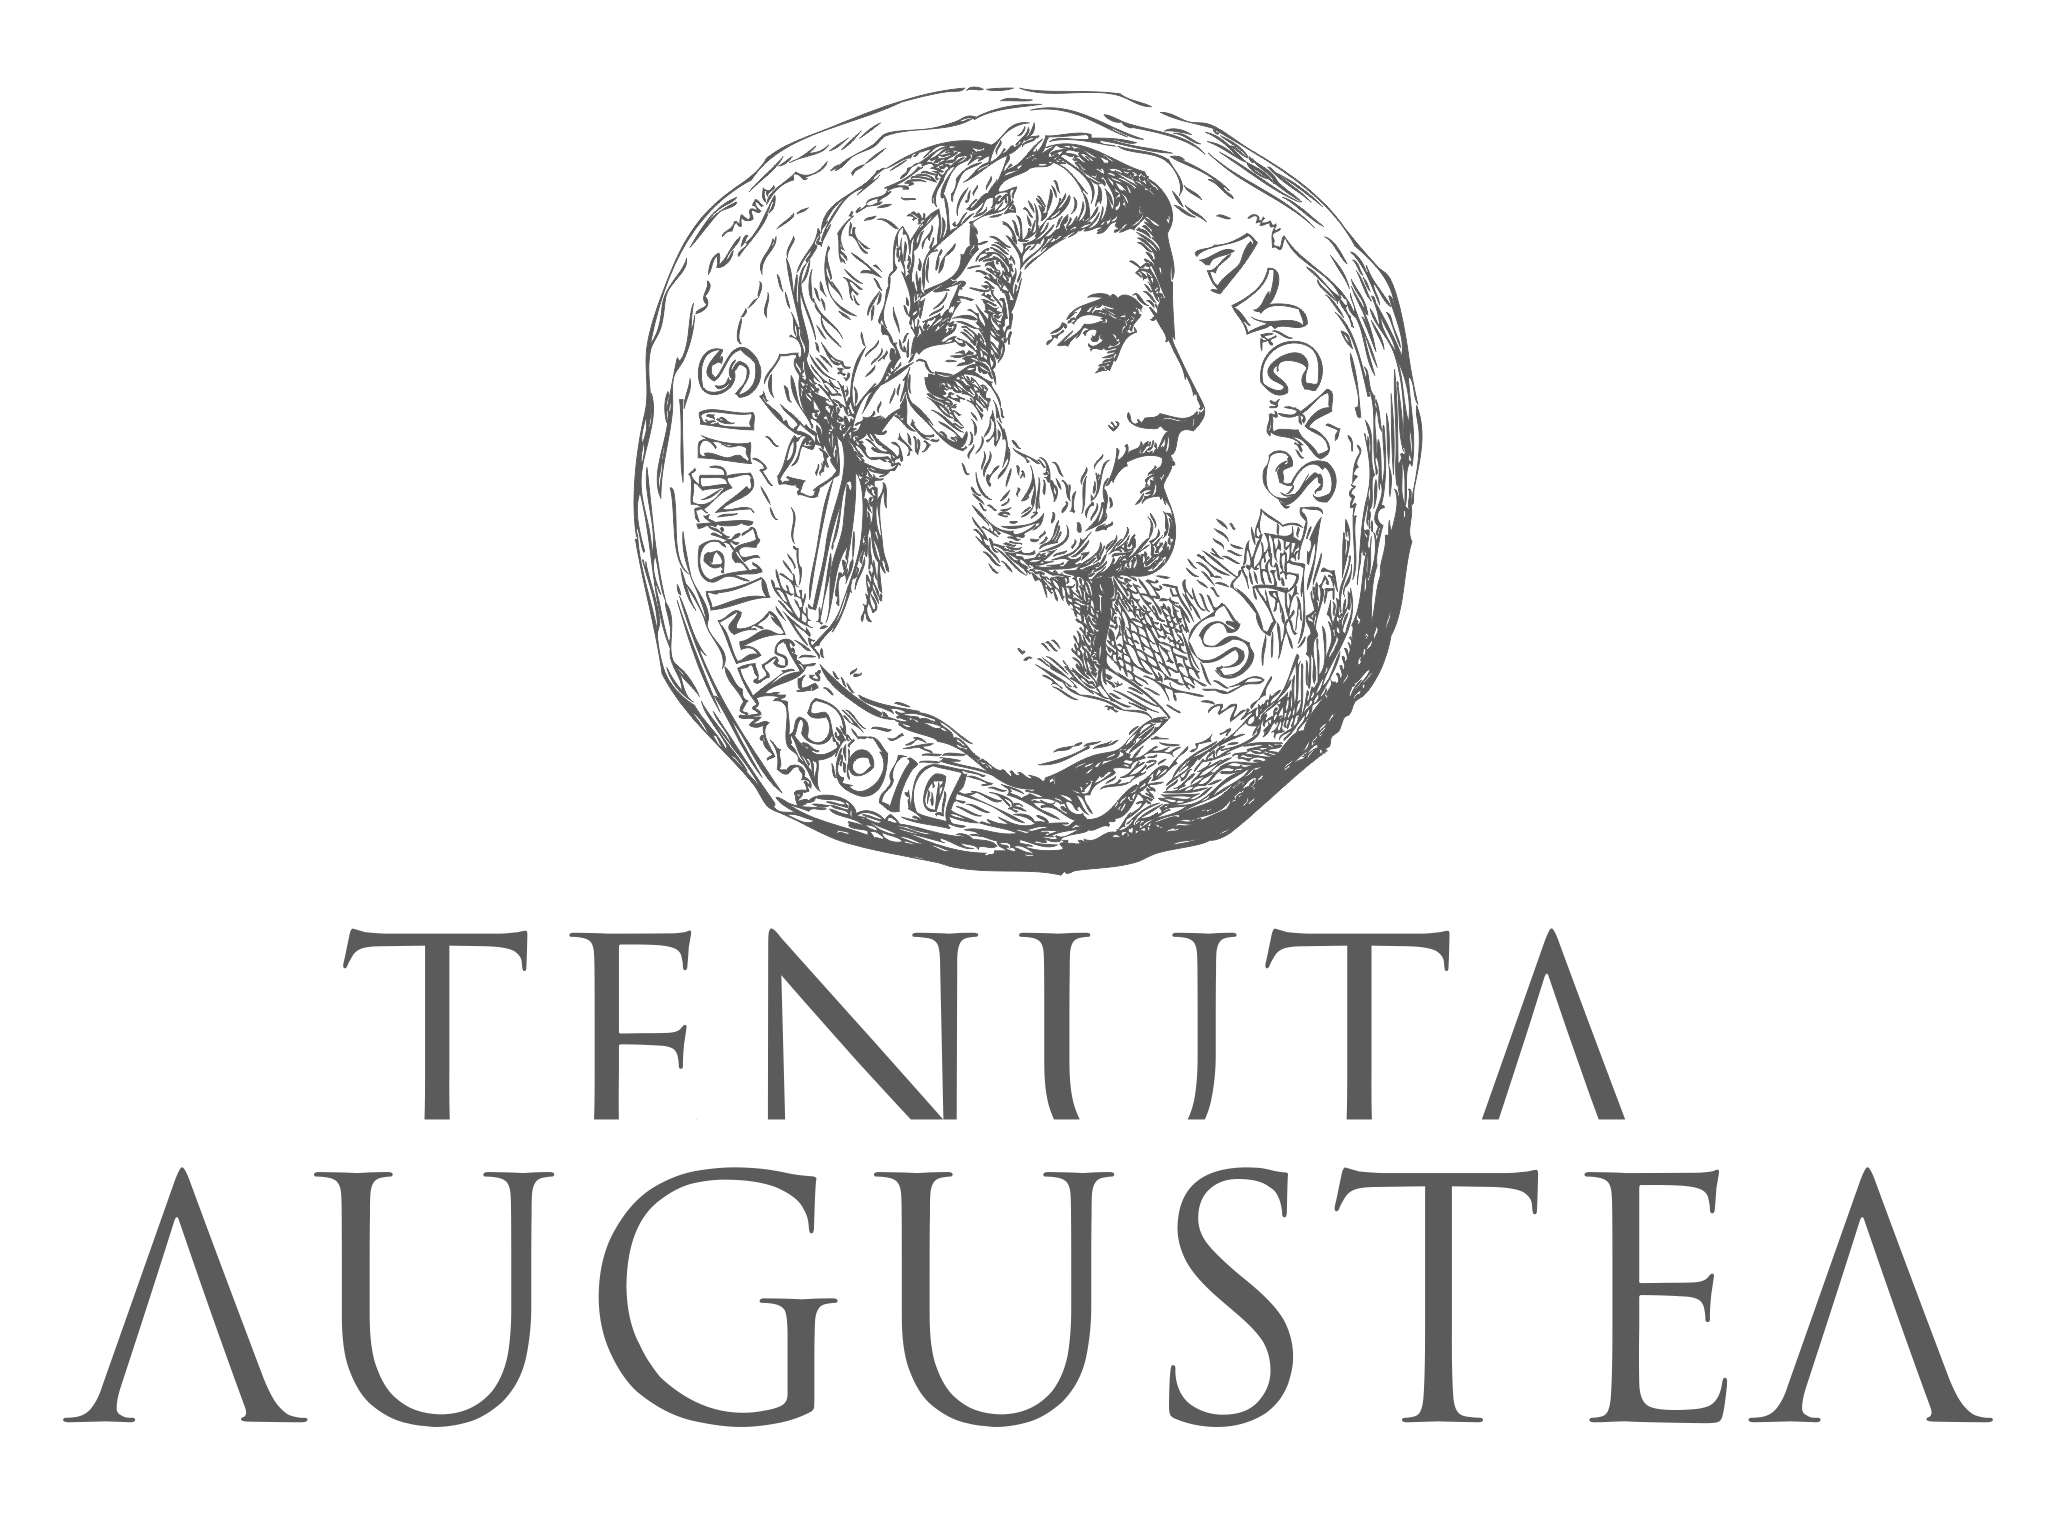 logo augustea nocerino wines